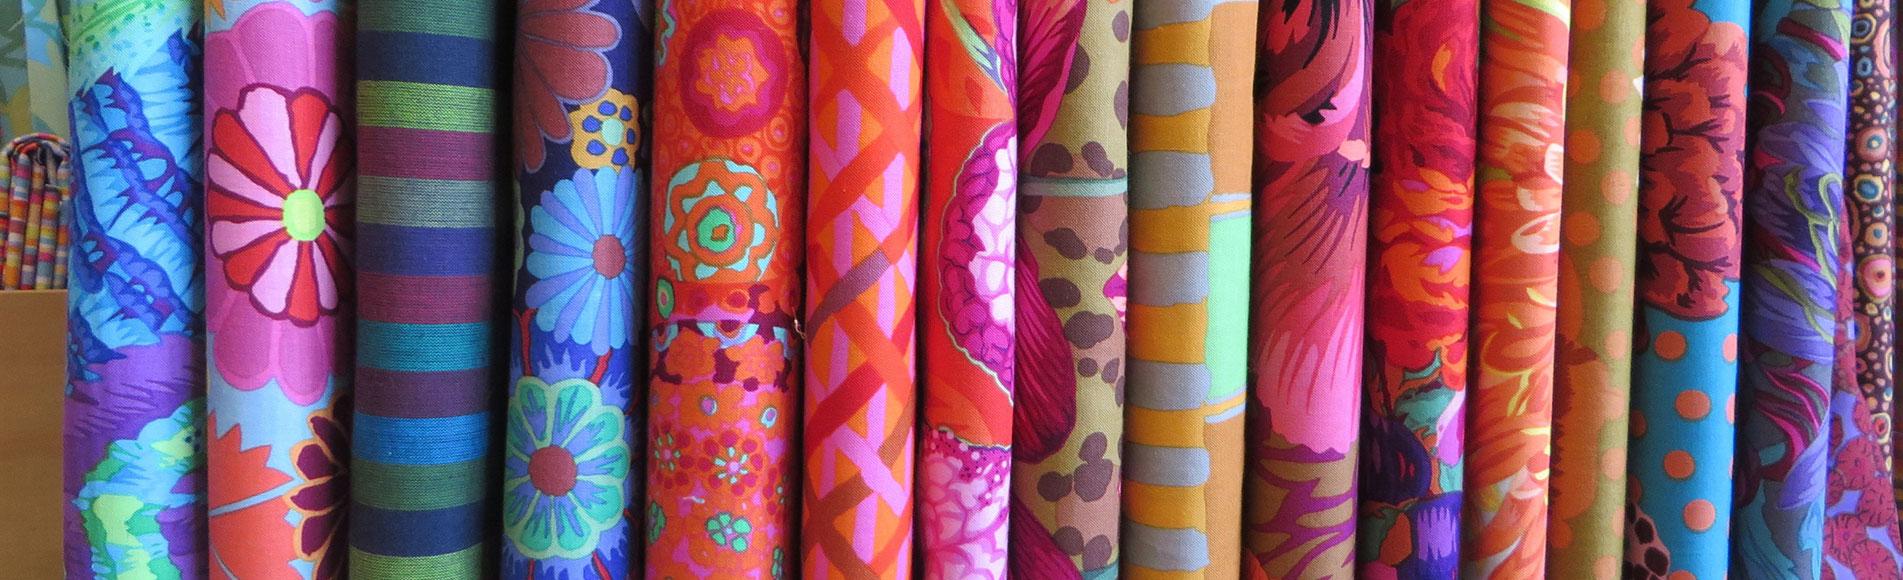 Doll Bear Products Cushlas Village Fabrics New Zealand